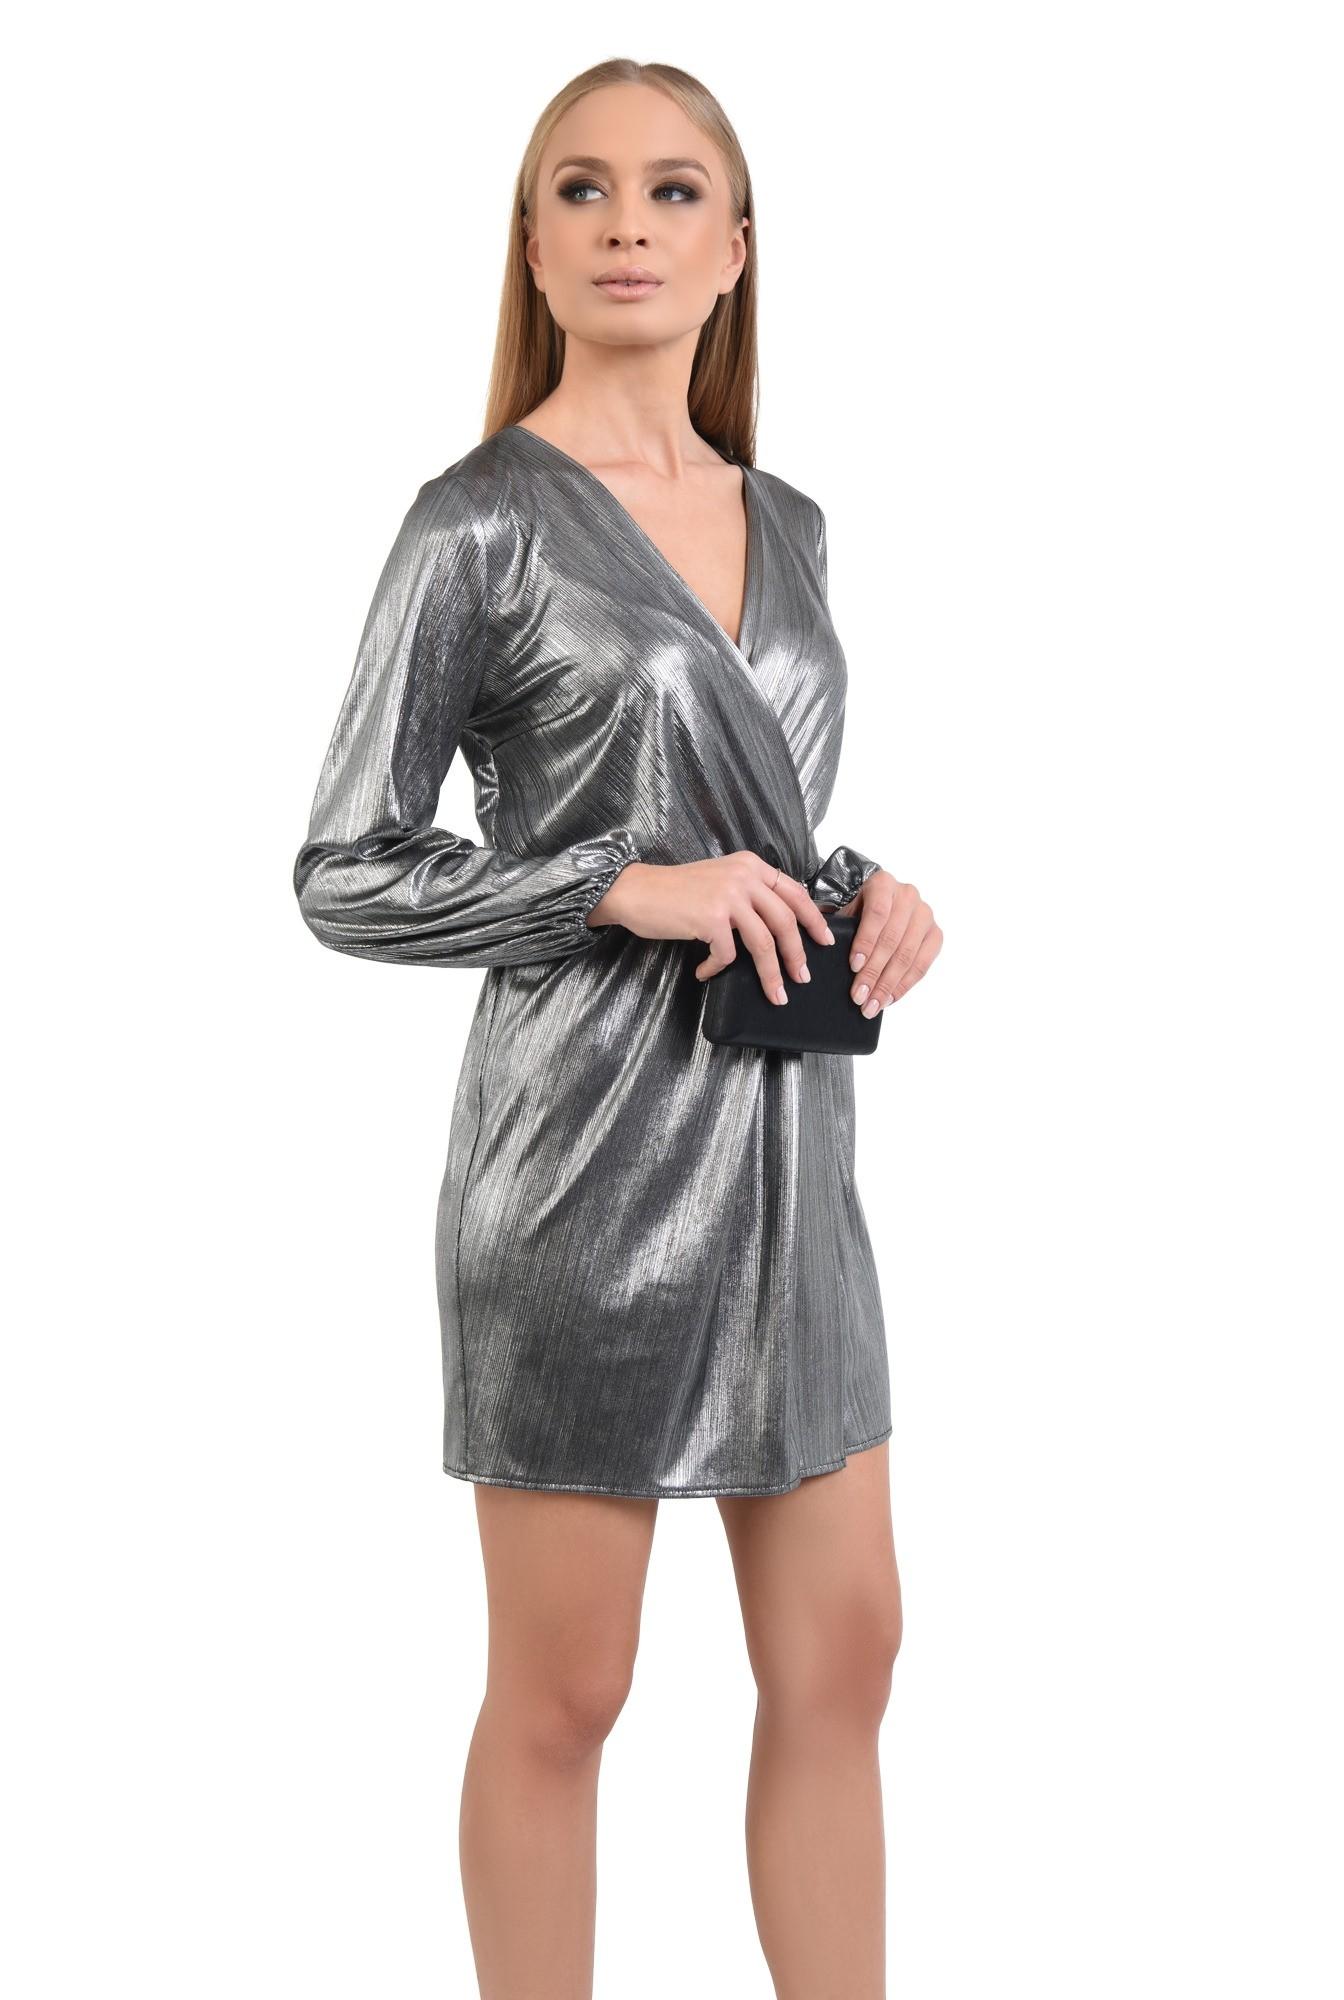 0 - rochie de seara, lurex argintiu, talie elastica, anchior petrecut